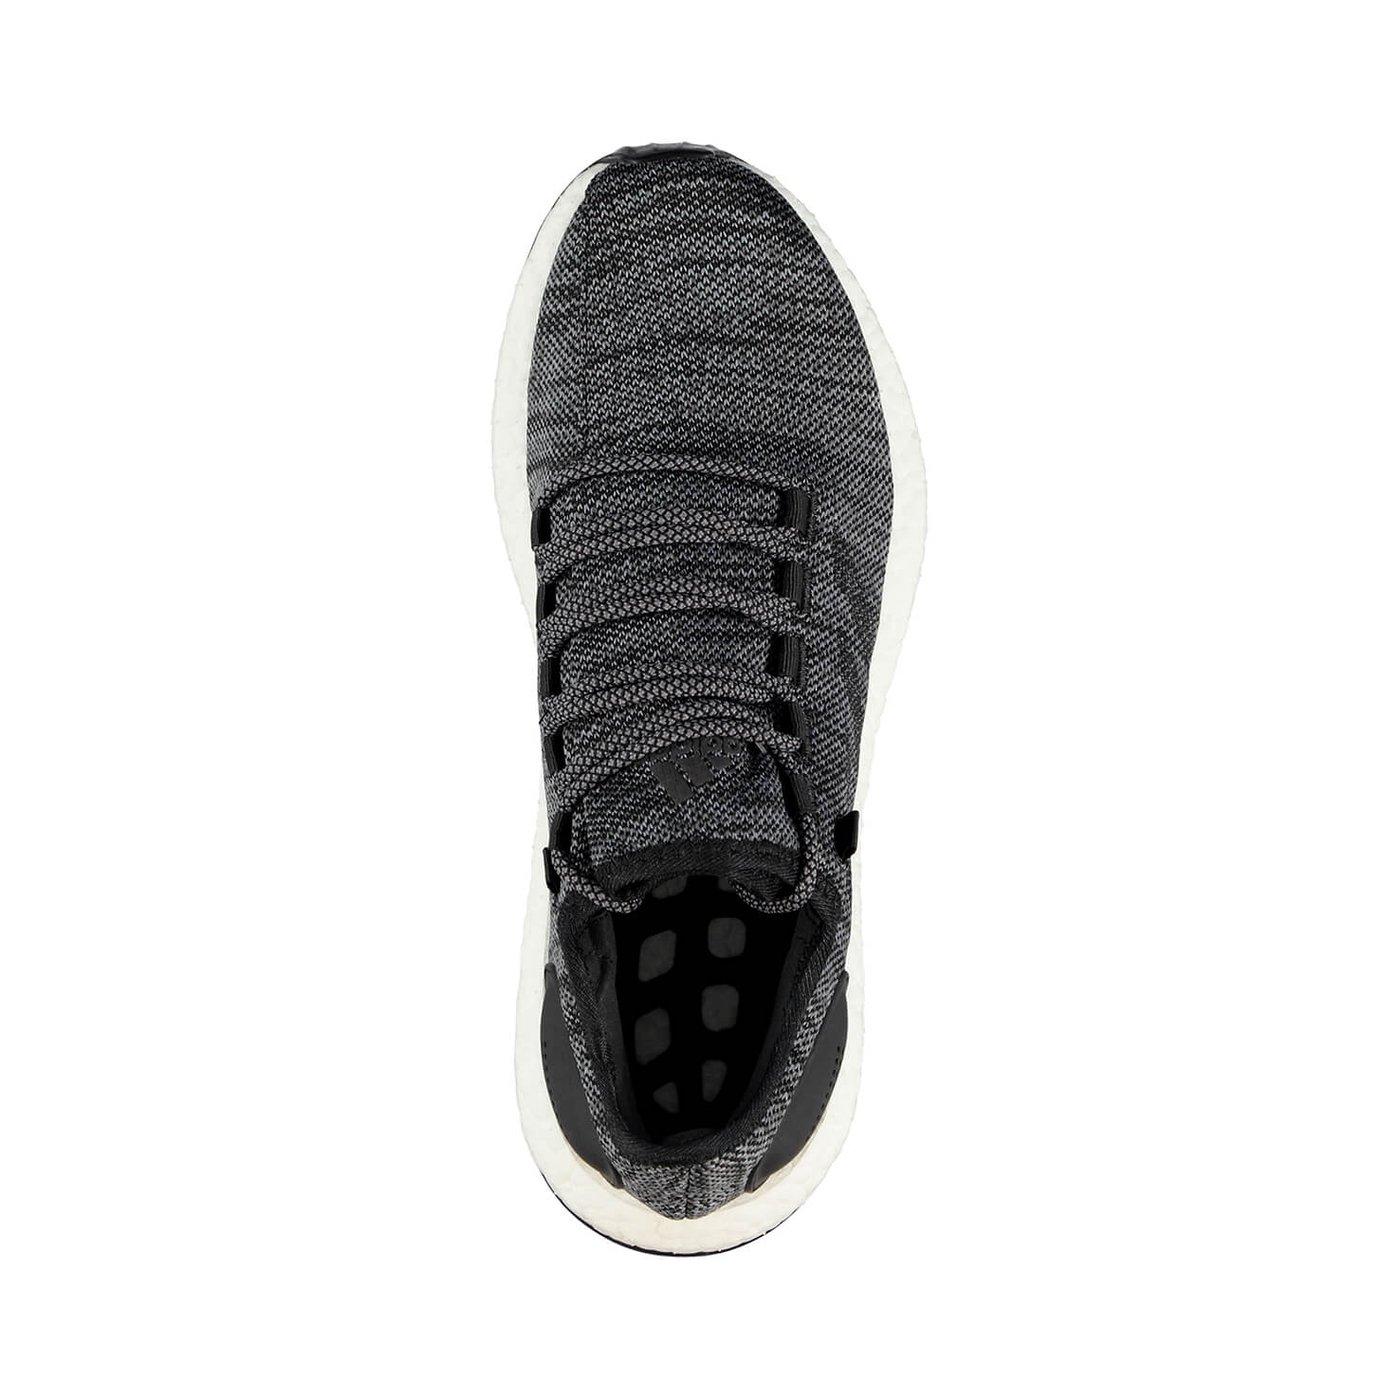 adidas Pureboost Atr Erkek Siyah Spor Ayakkabı